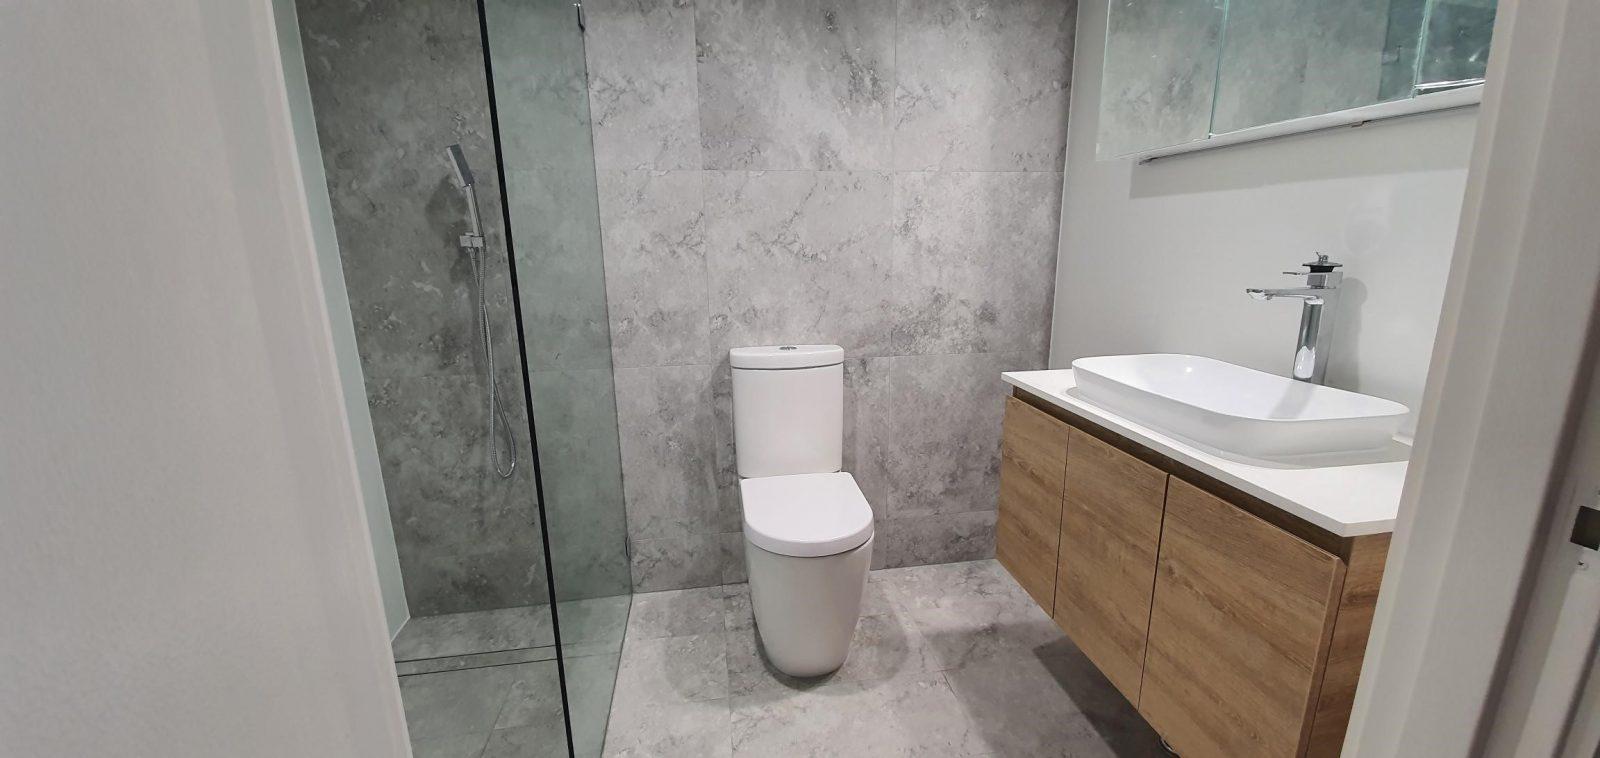 NEW - Bathroom